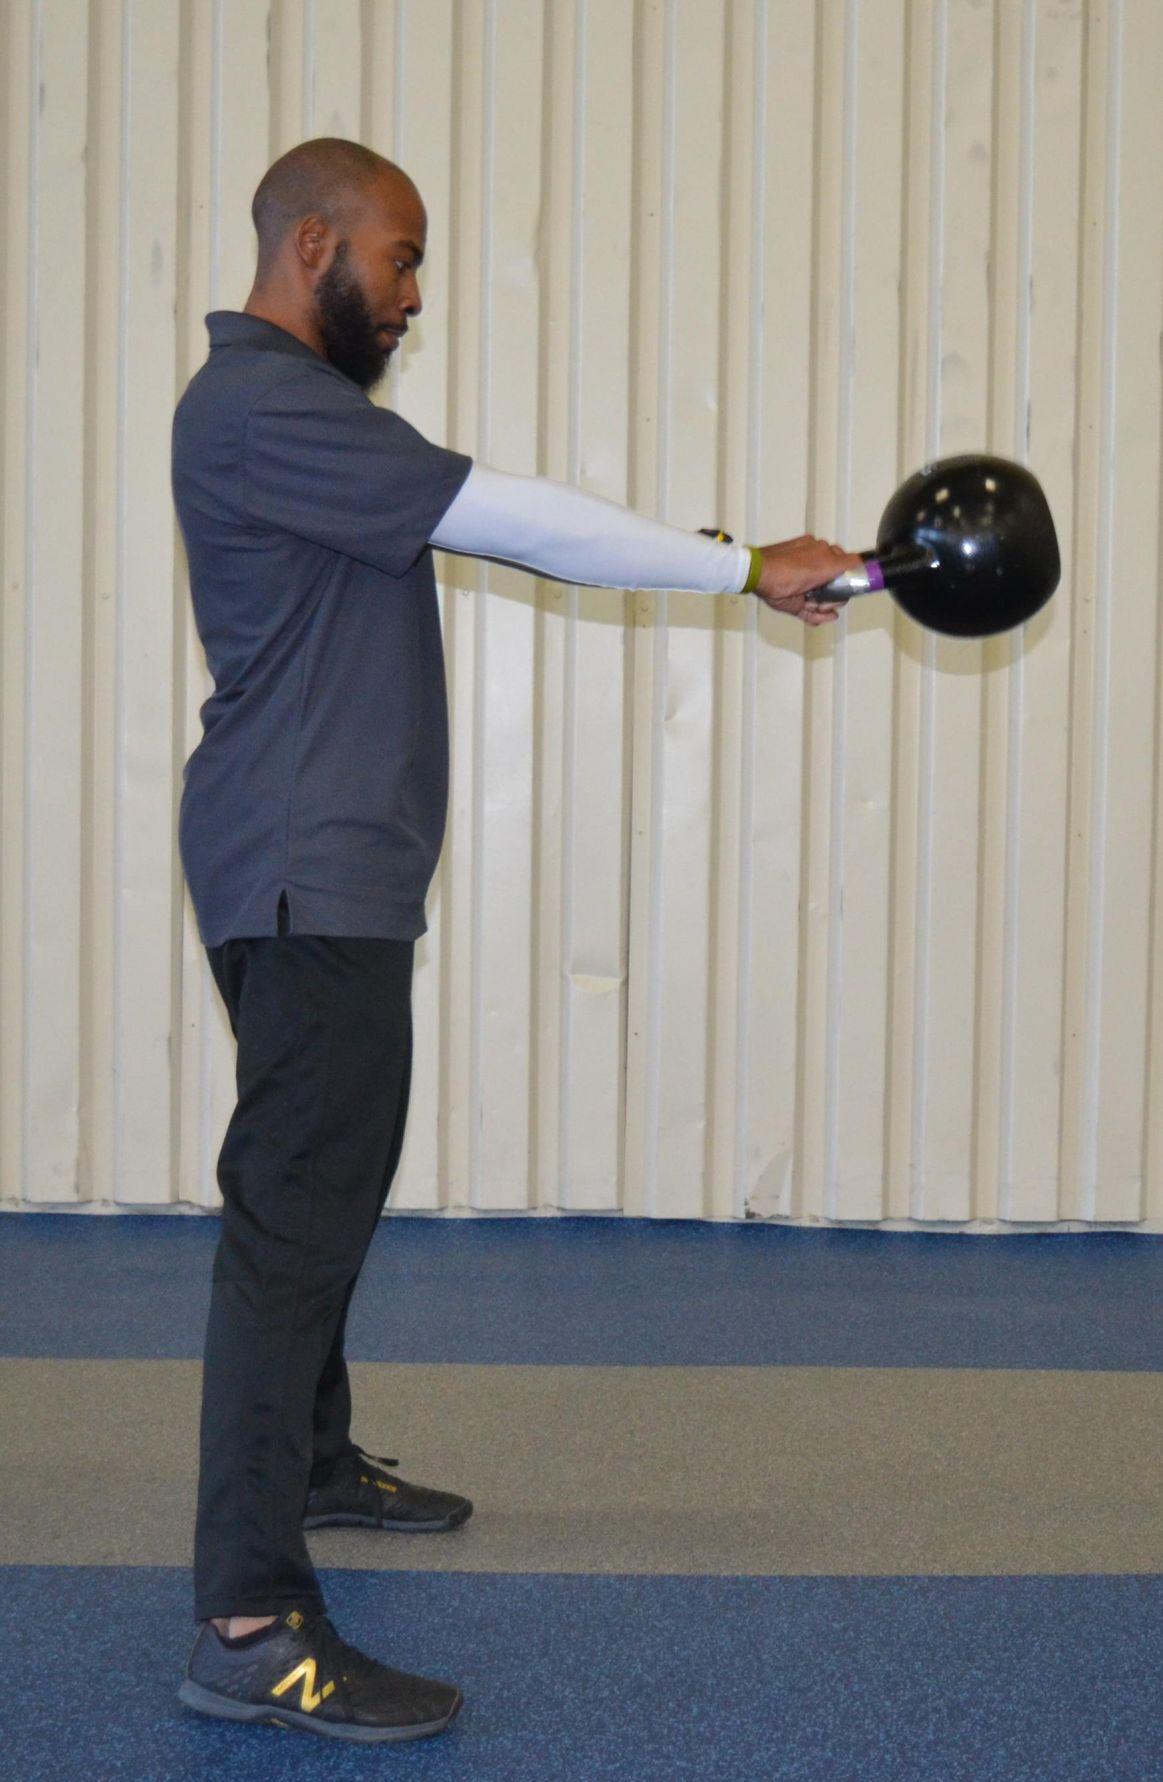 Hardstyle Kettlebell Swing